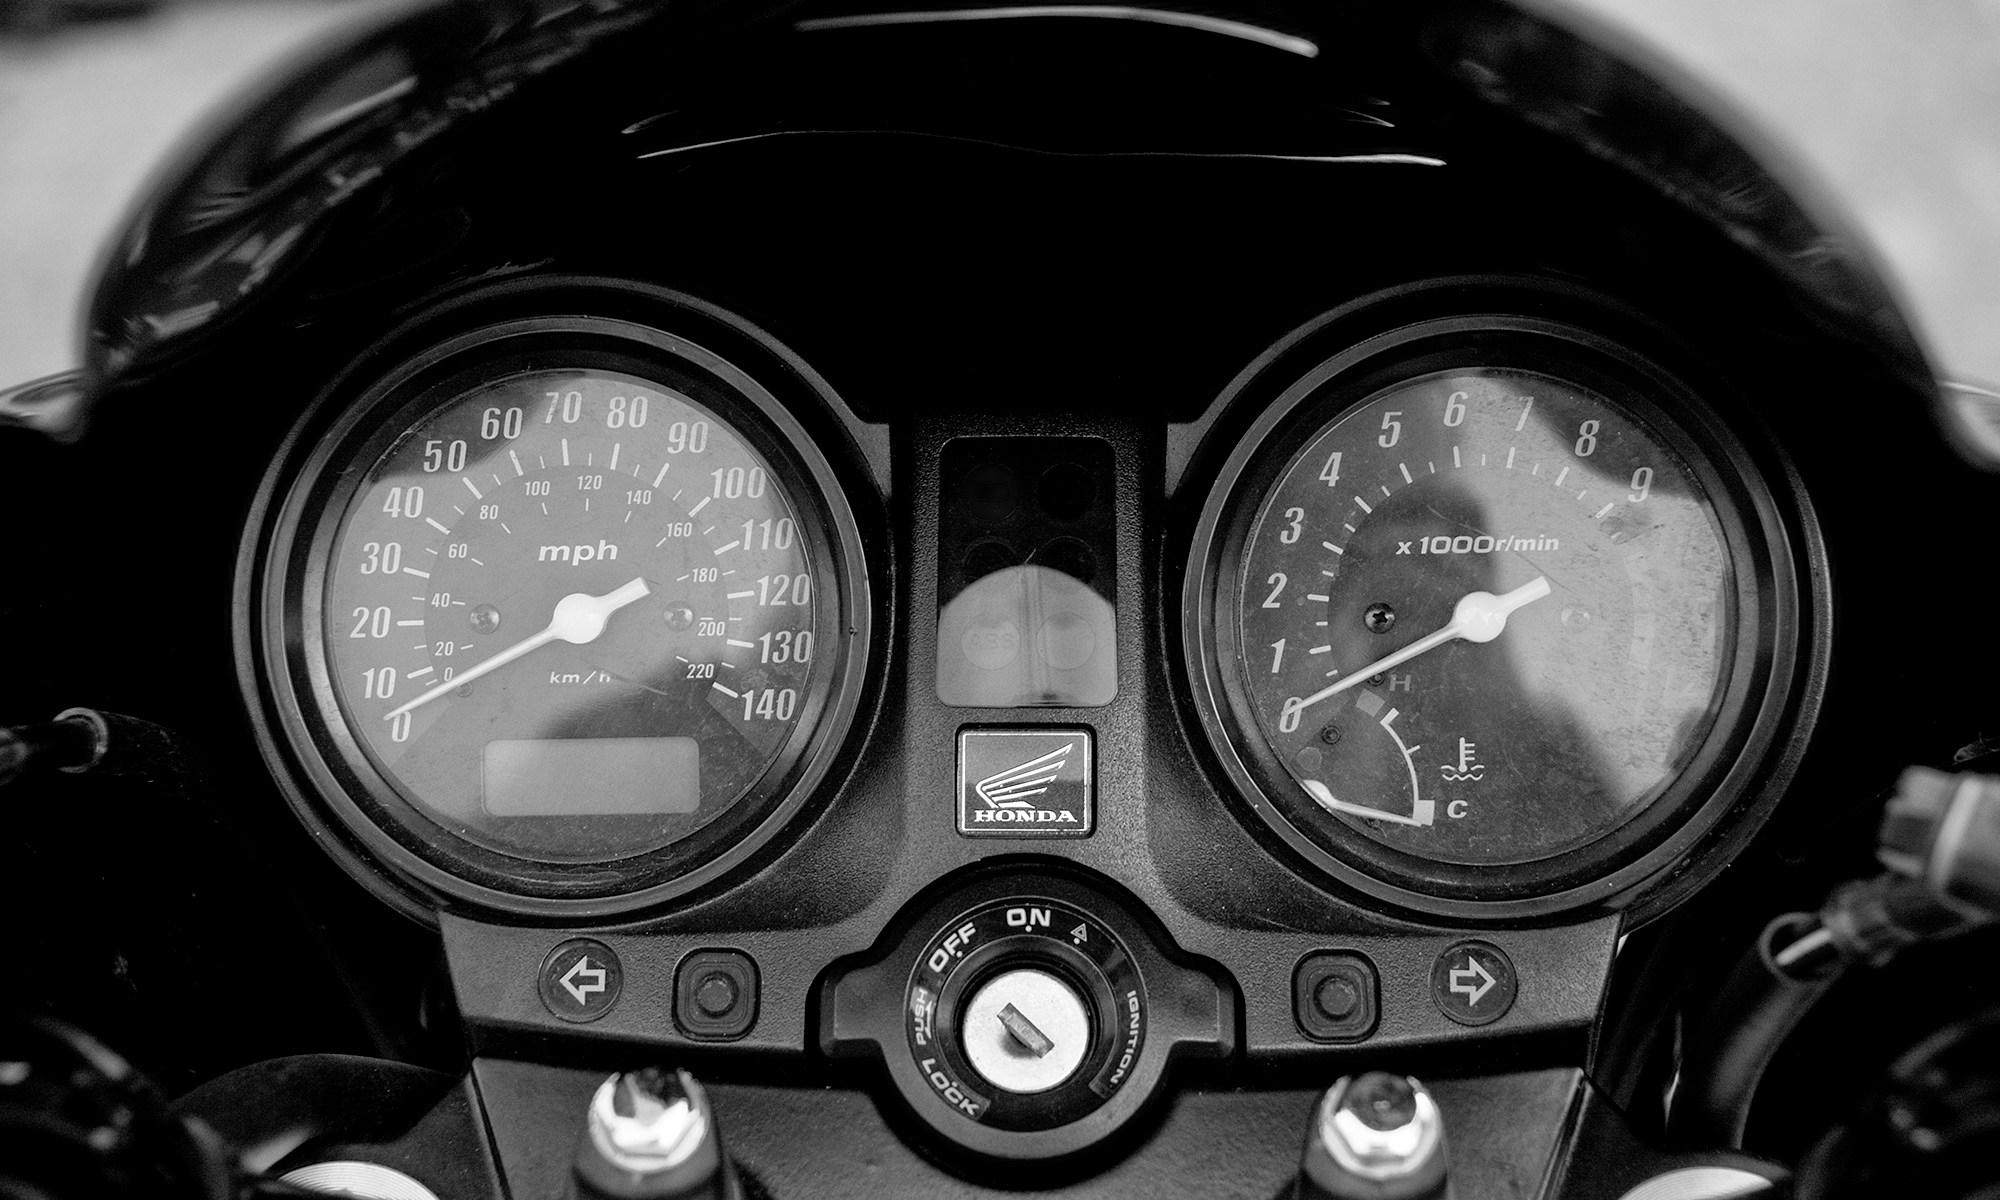 Honda CBF500 Motorcycle Instruments